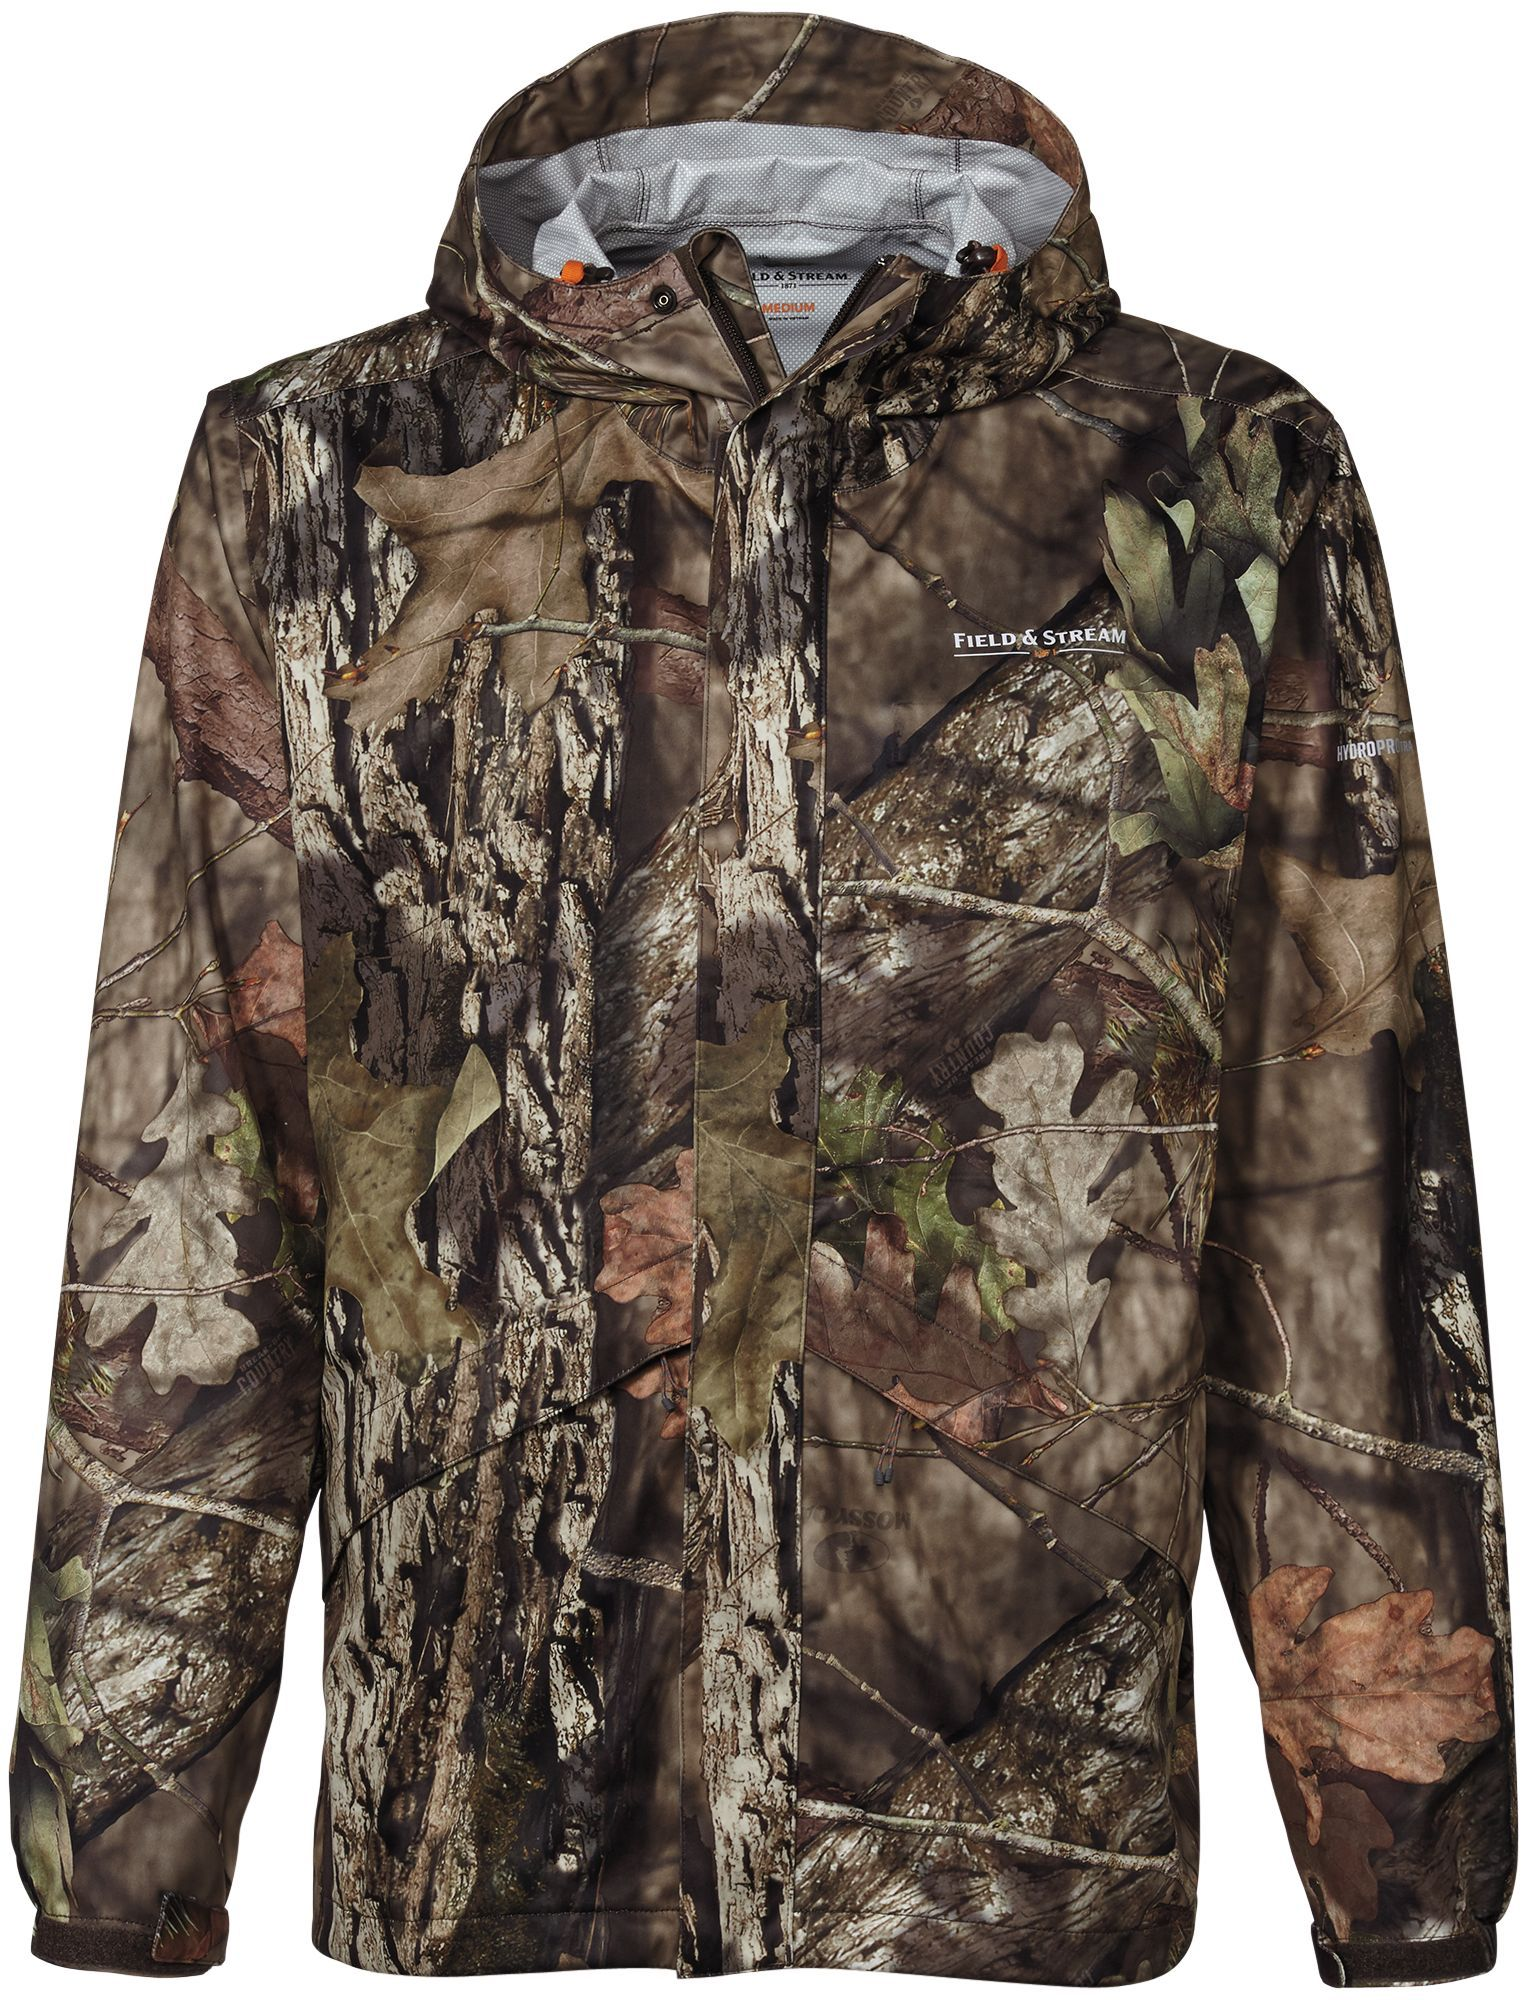 276cd944cb898 Field & Stream Lightweight Packable Rain Hunting Jacket, Men's, Size: XXL,  Mossy Oak Brk-Up Country